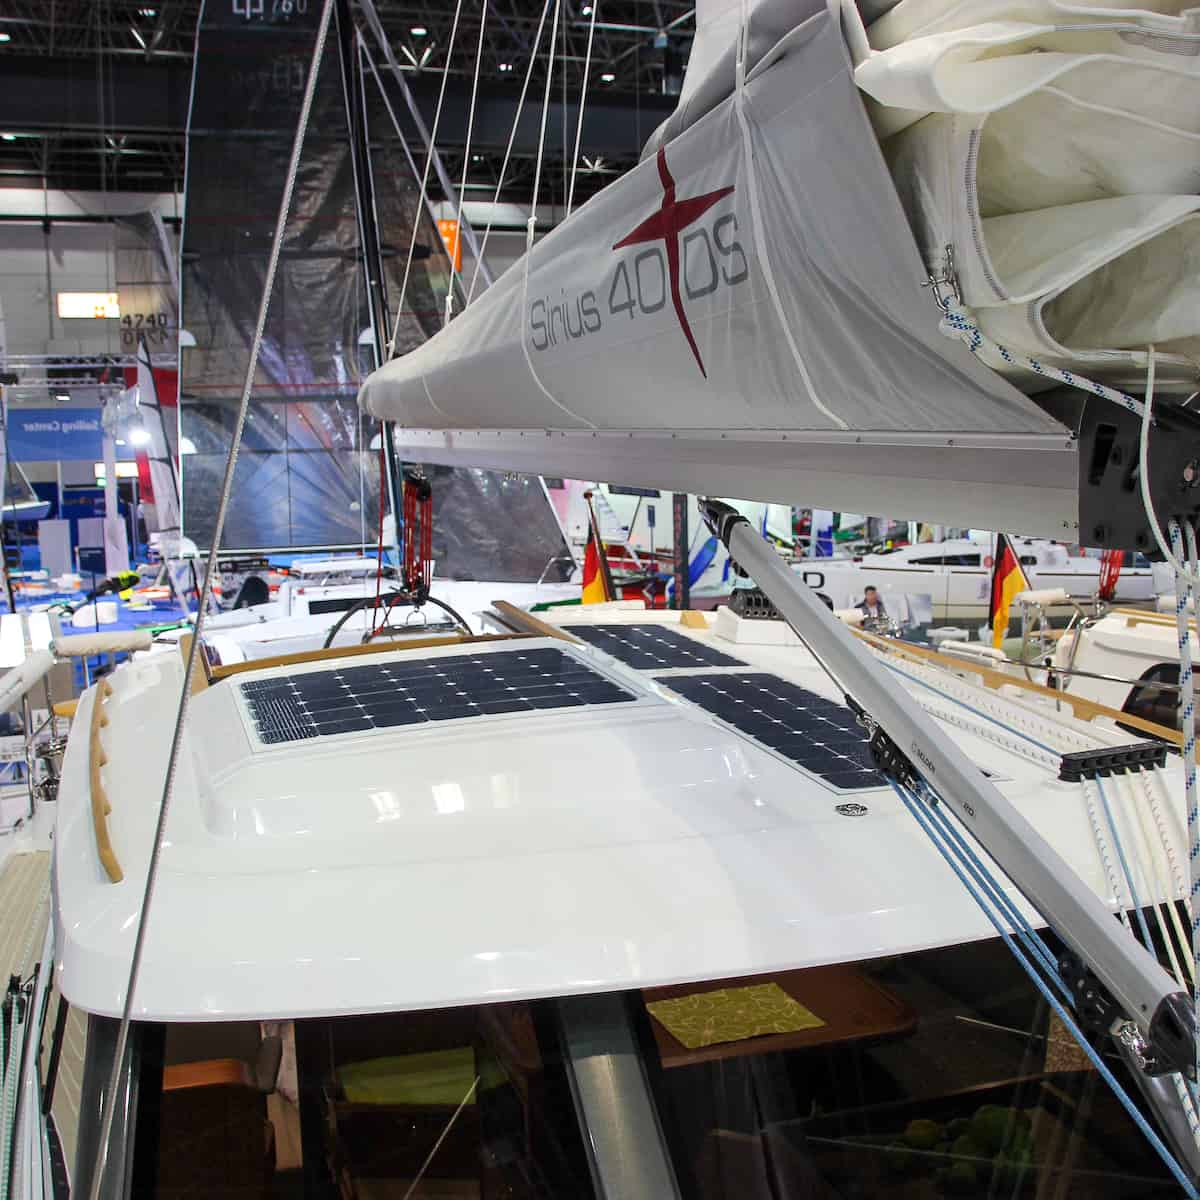 Sirius 40 DS photovoltaic solar panels sailing yacht Solbian